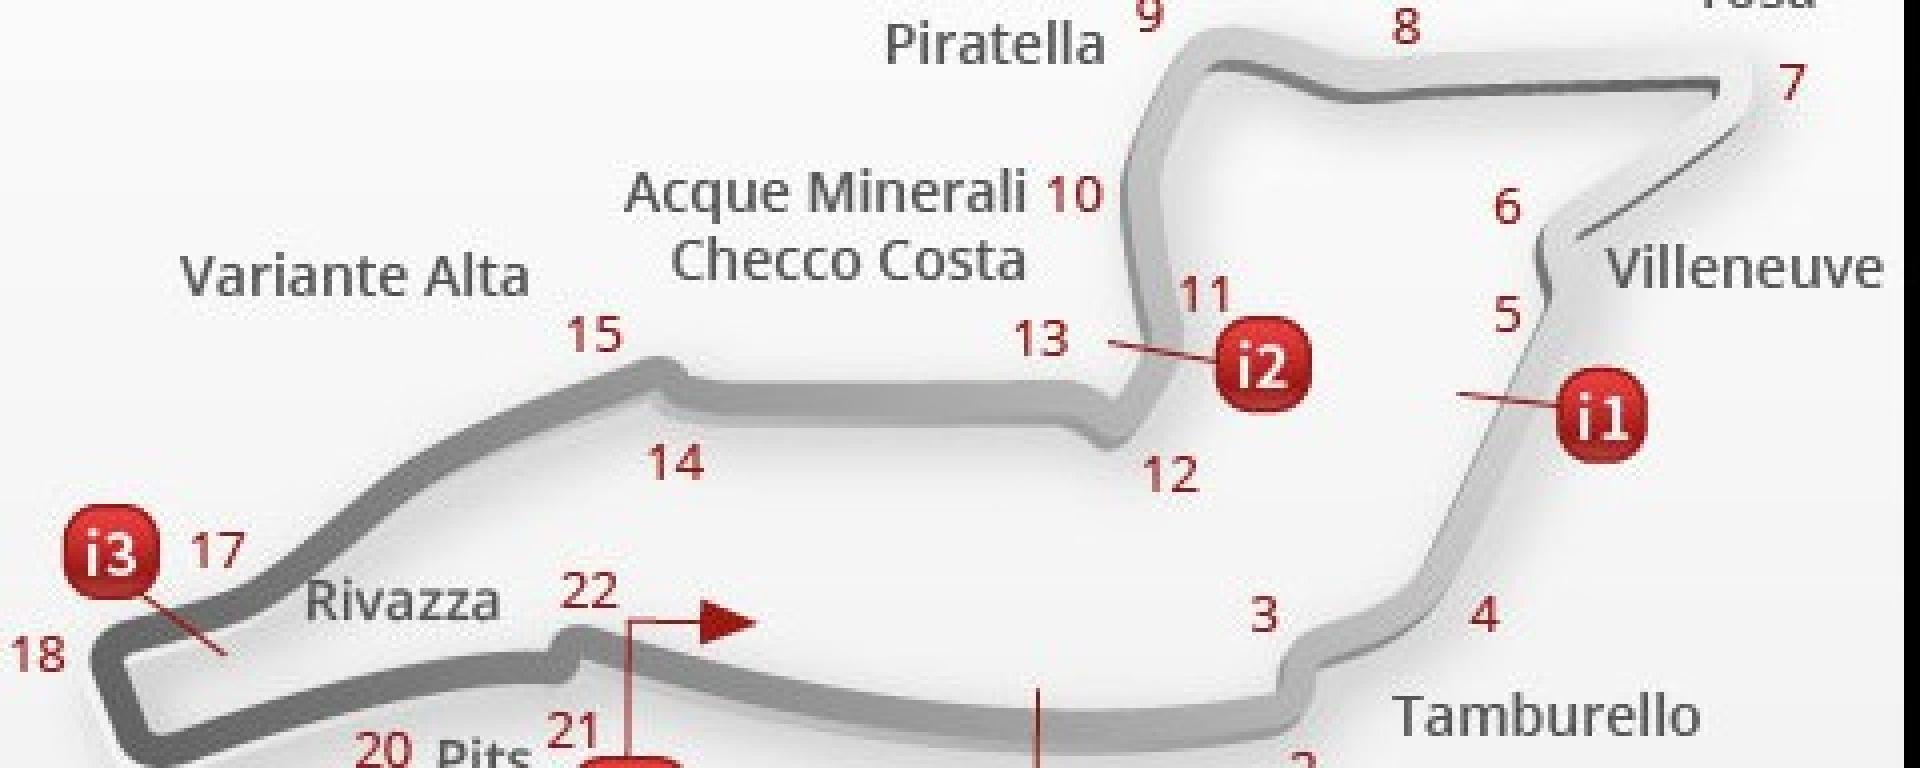 Gran Premio d'Italia Imola Superbike: risultati Gara 1 e Gara 2